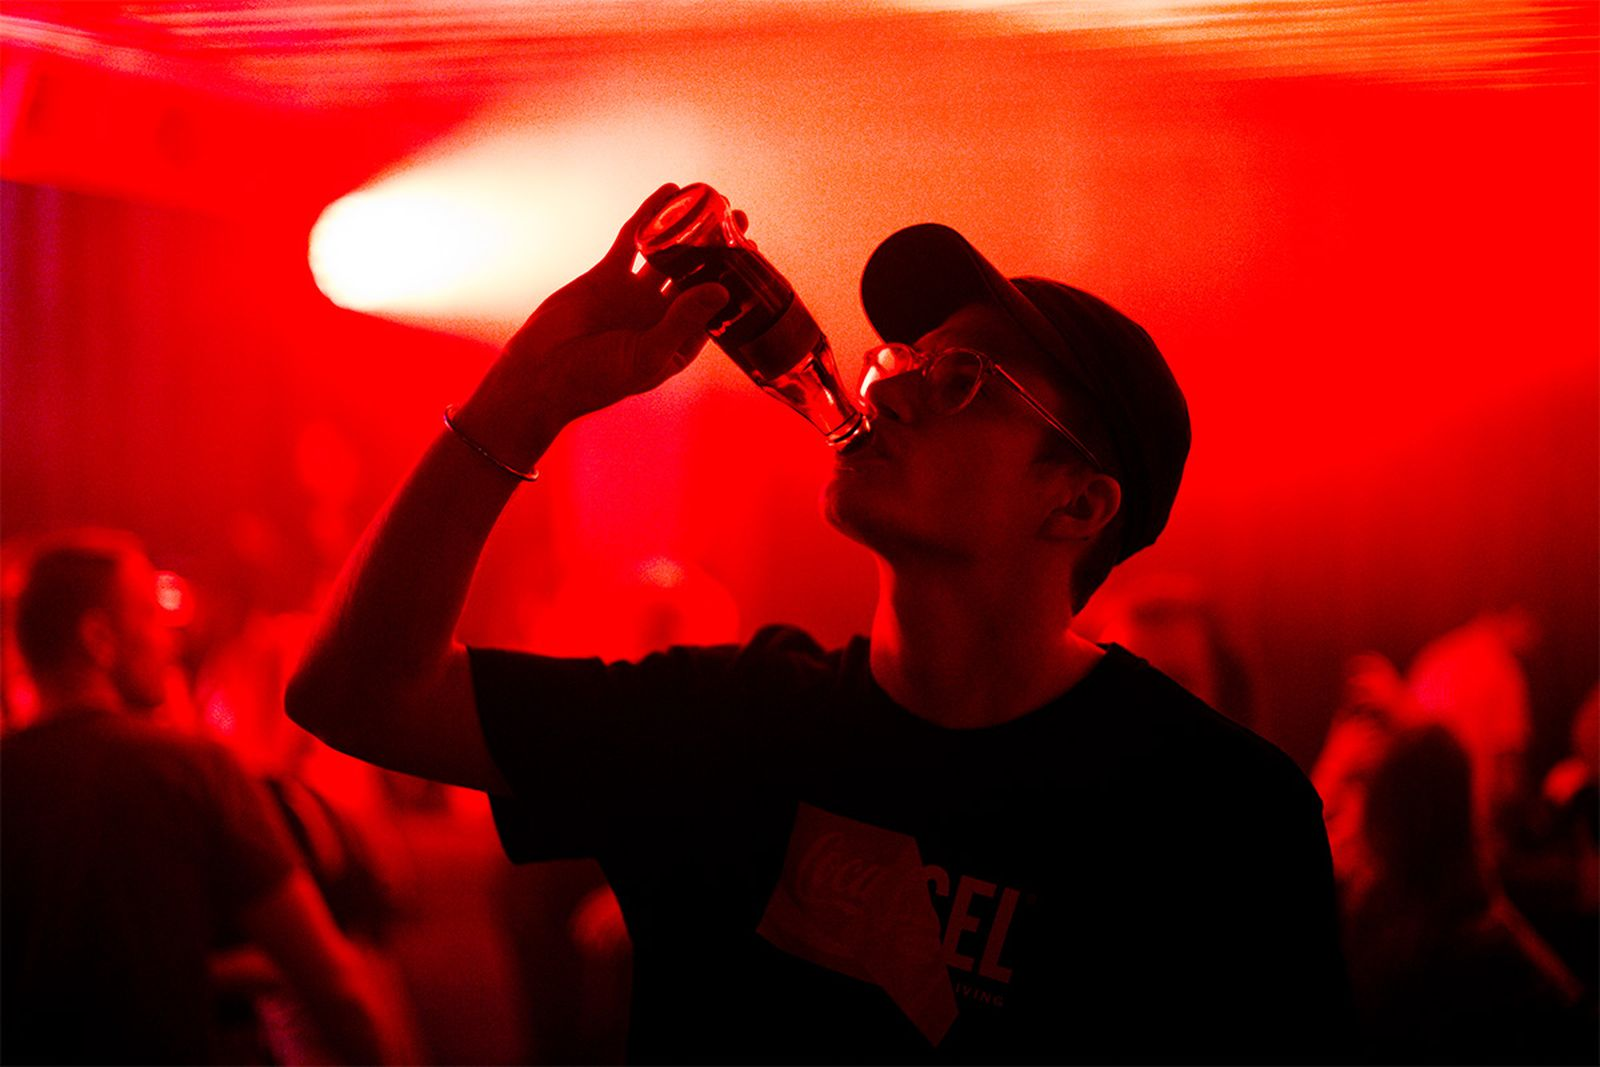 diesel x coca cola launch party berlin